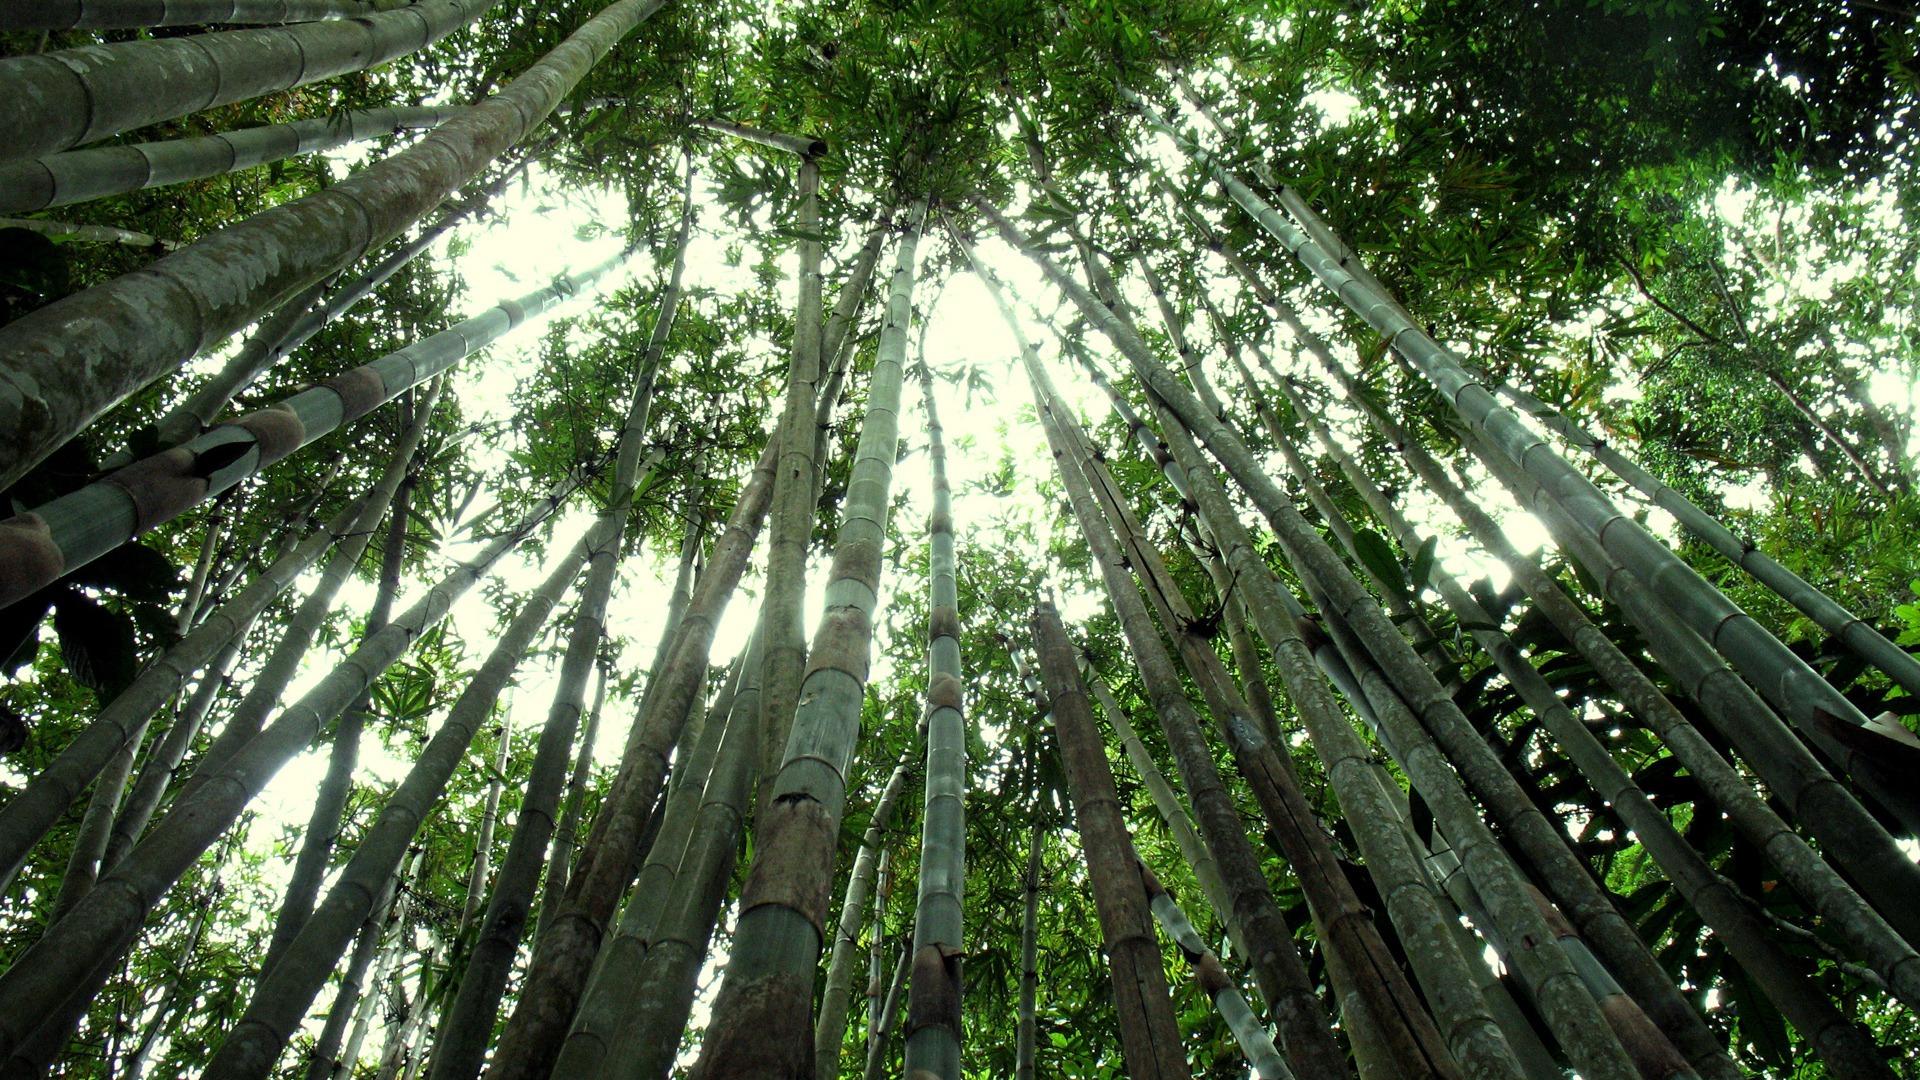 Bamboo Forest - HD Wallpaper